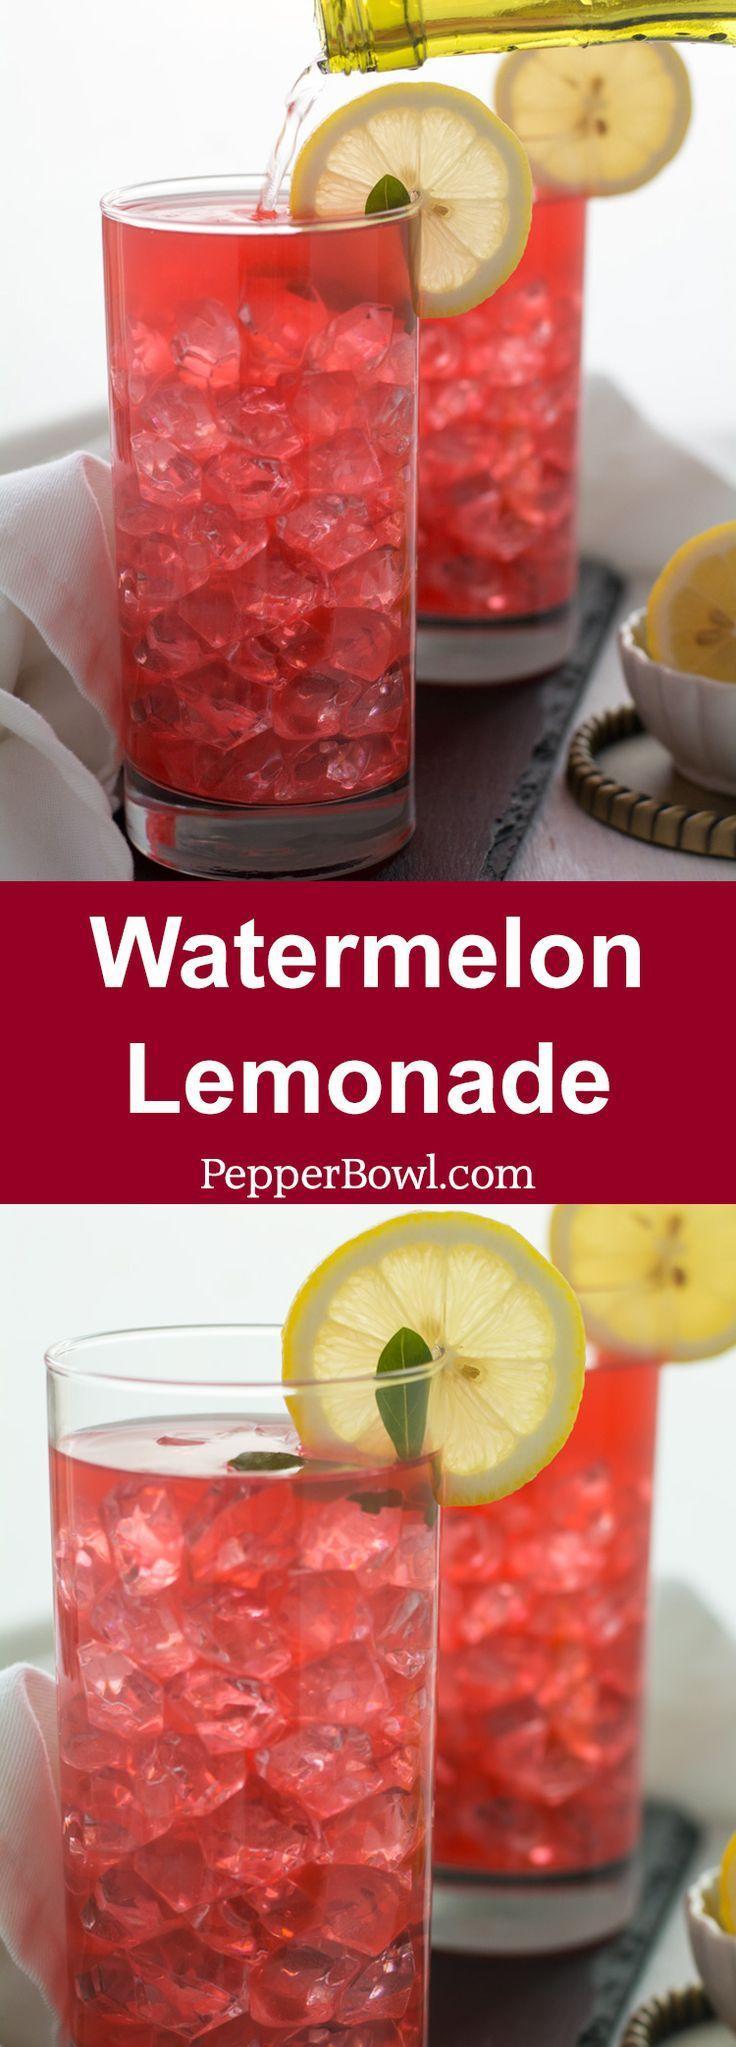 Boda - Watermelon Lemonade